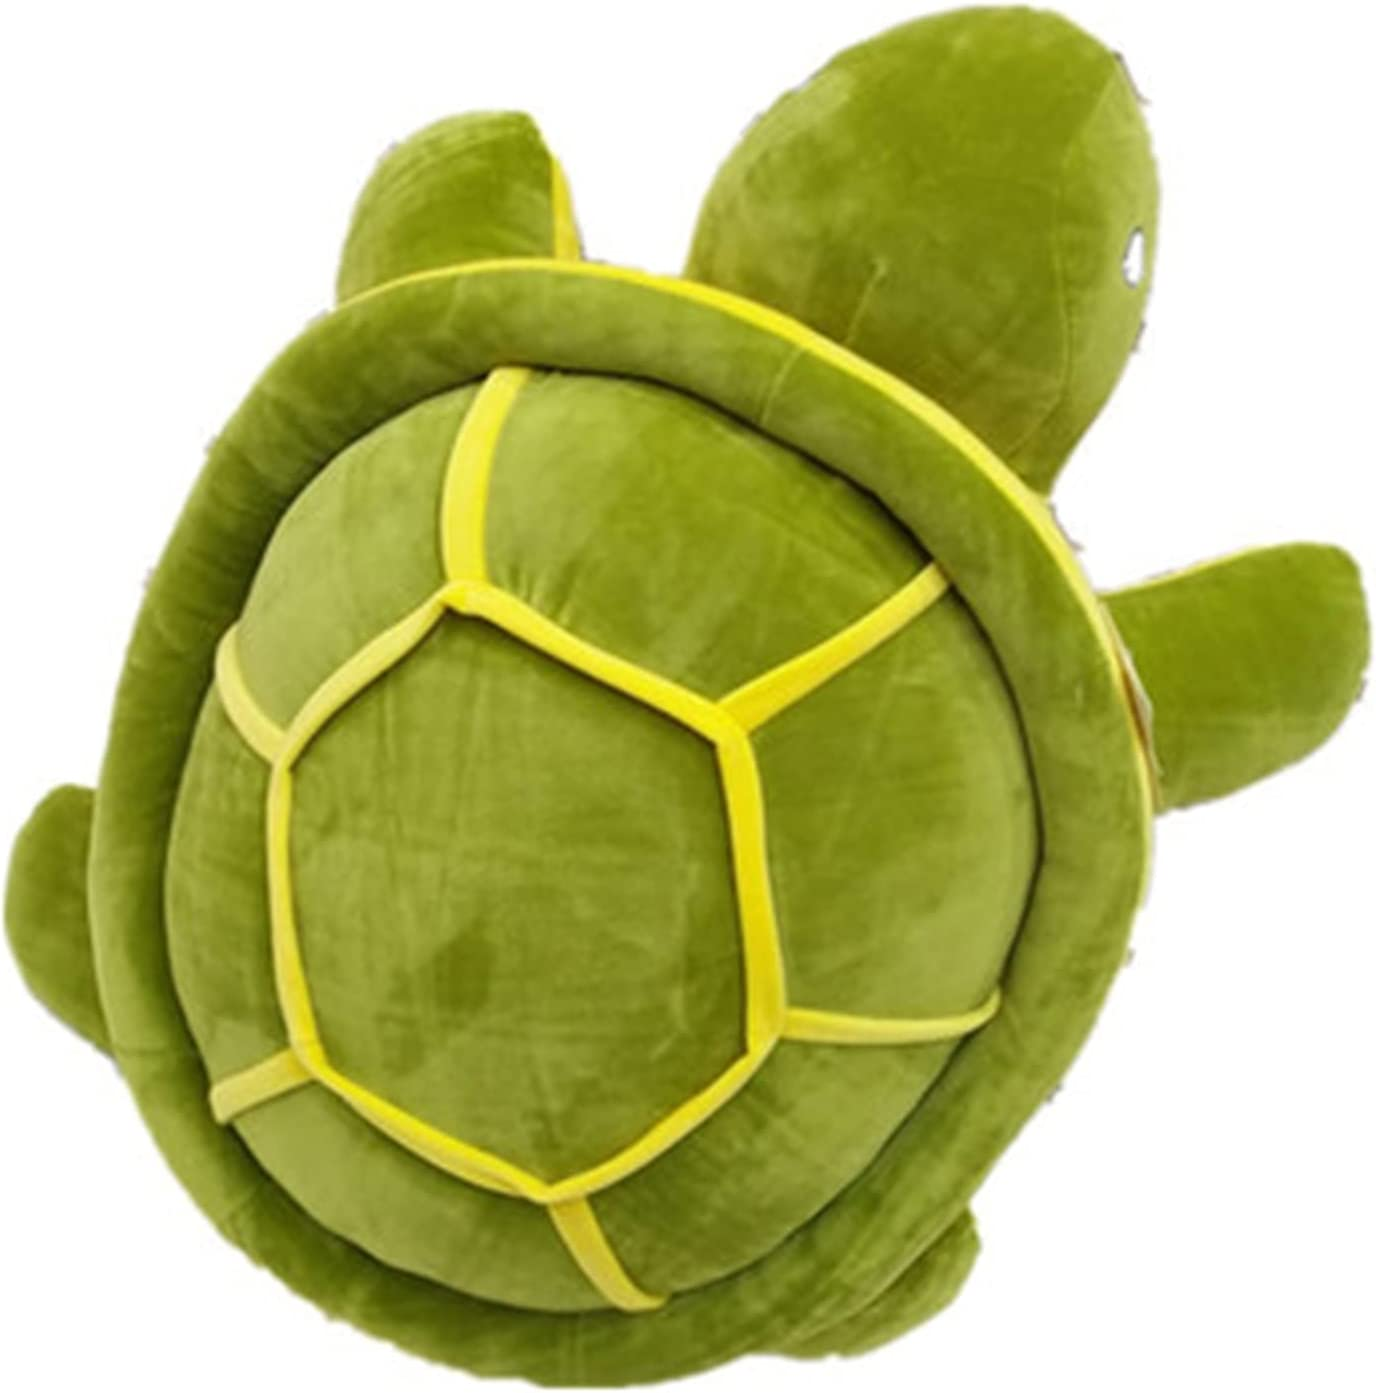 YSYSPJM Hugging In stock Pillow Superior Big Eyes Turtle Sea Tortoi Animal Stuffed